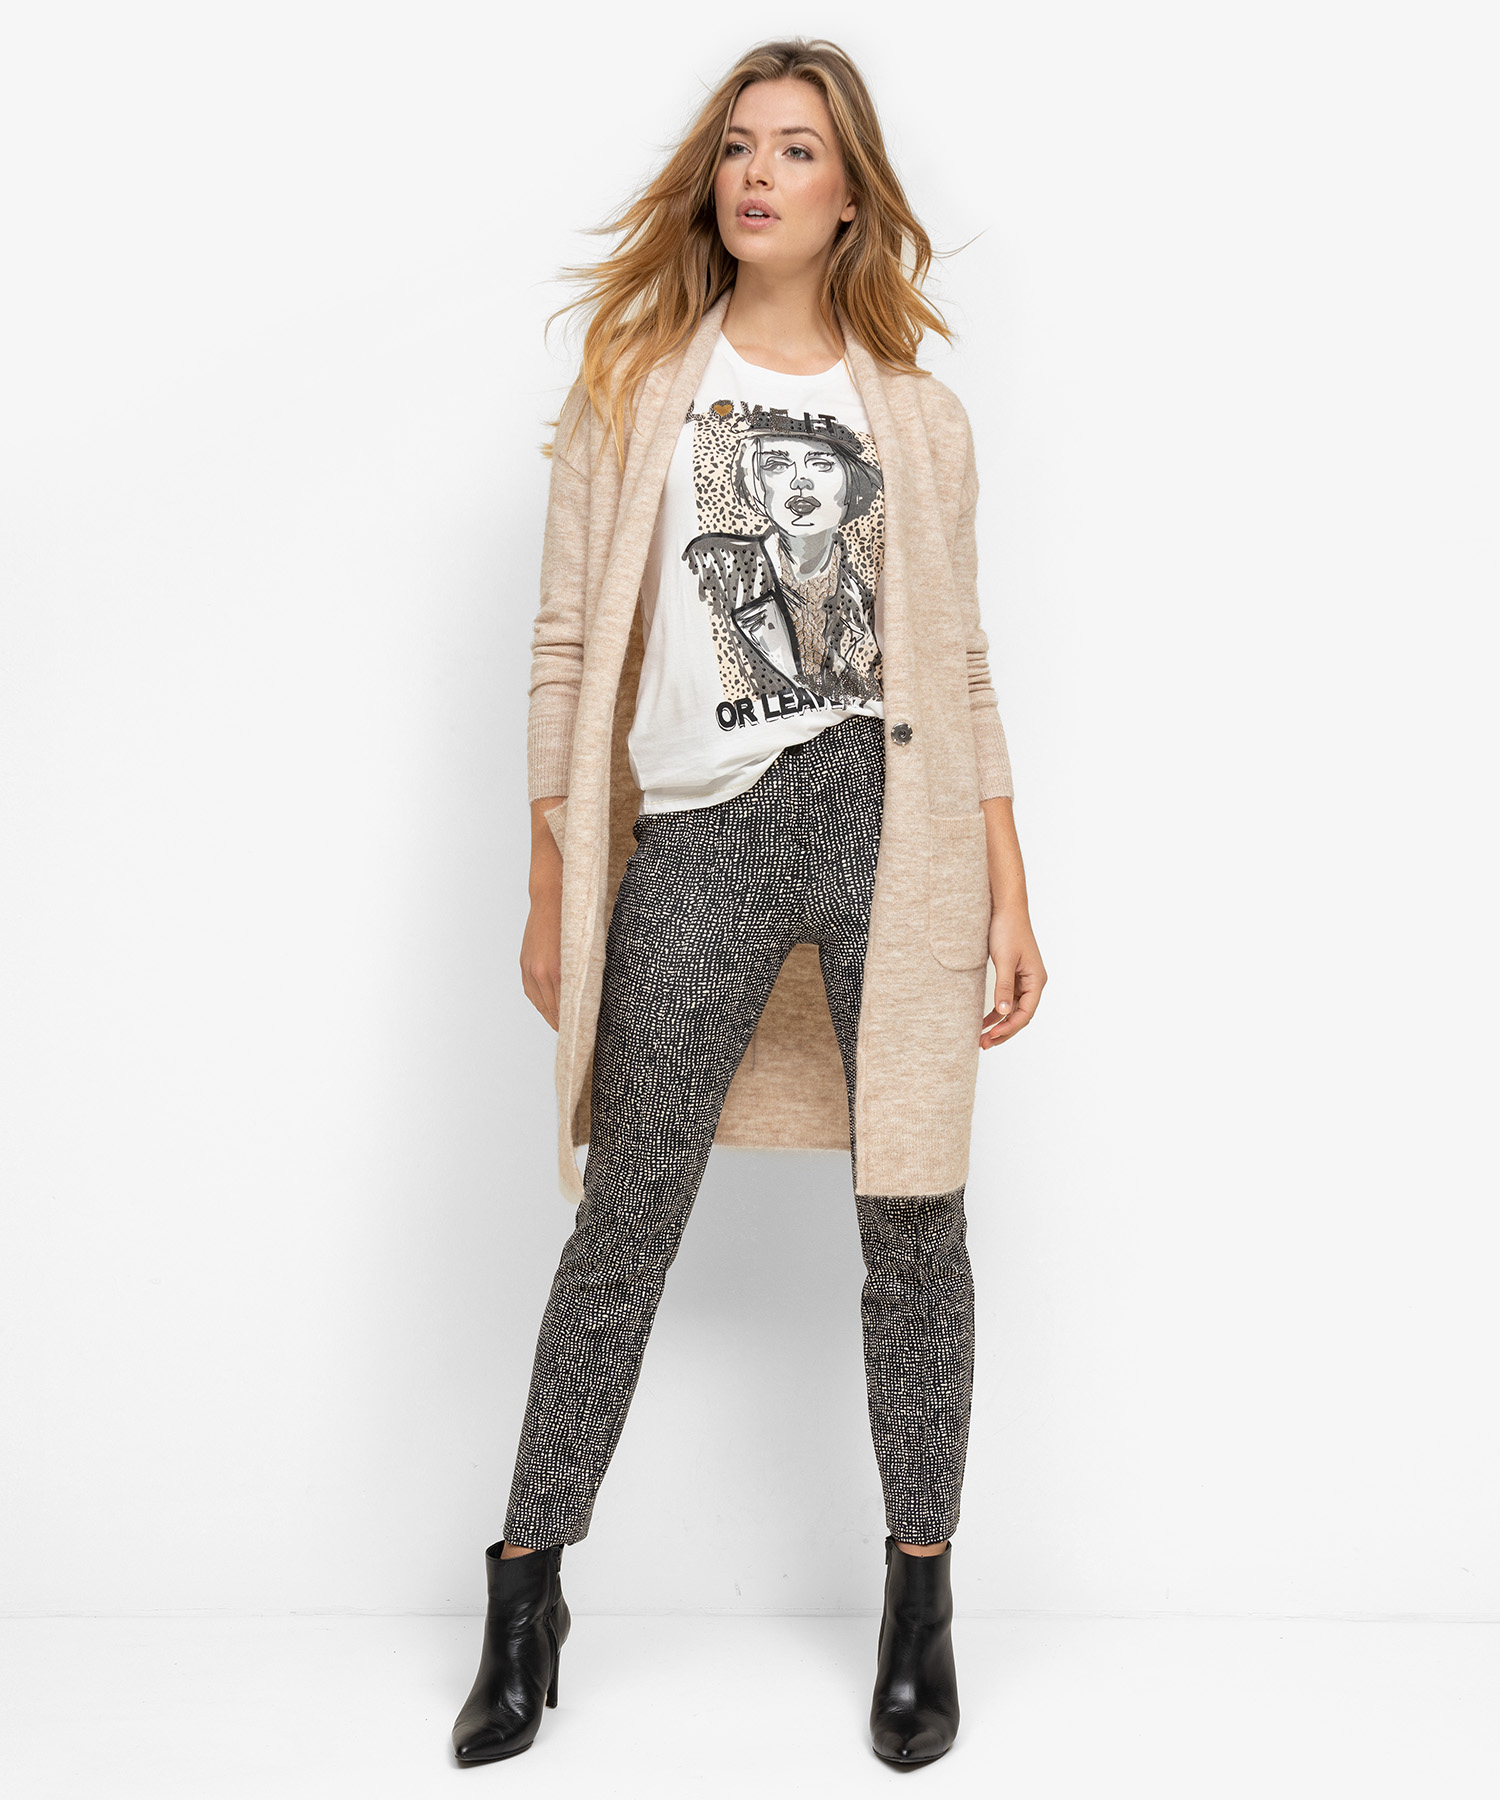 Cambio Ranee tweed jacquard pantalon